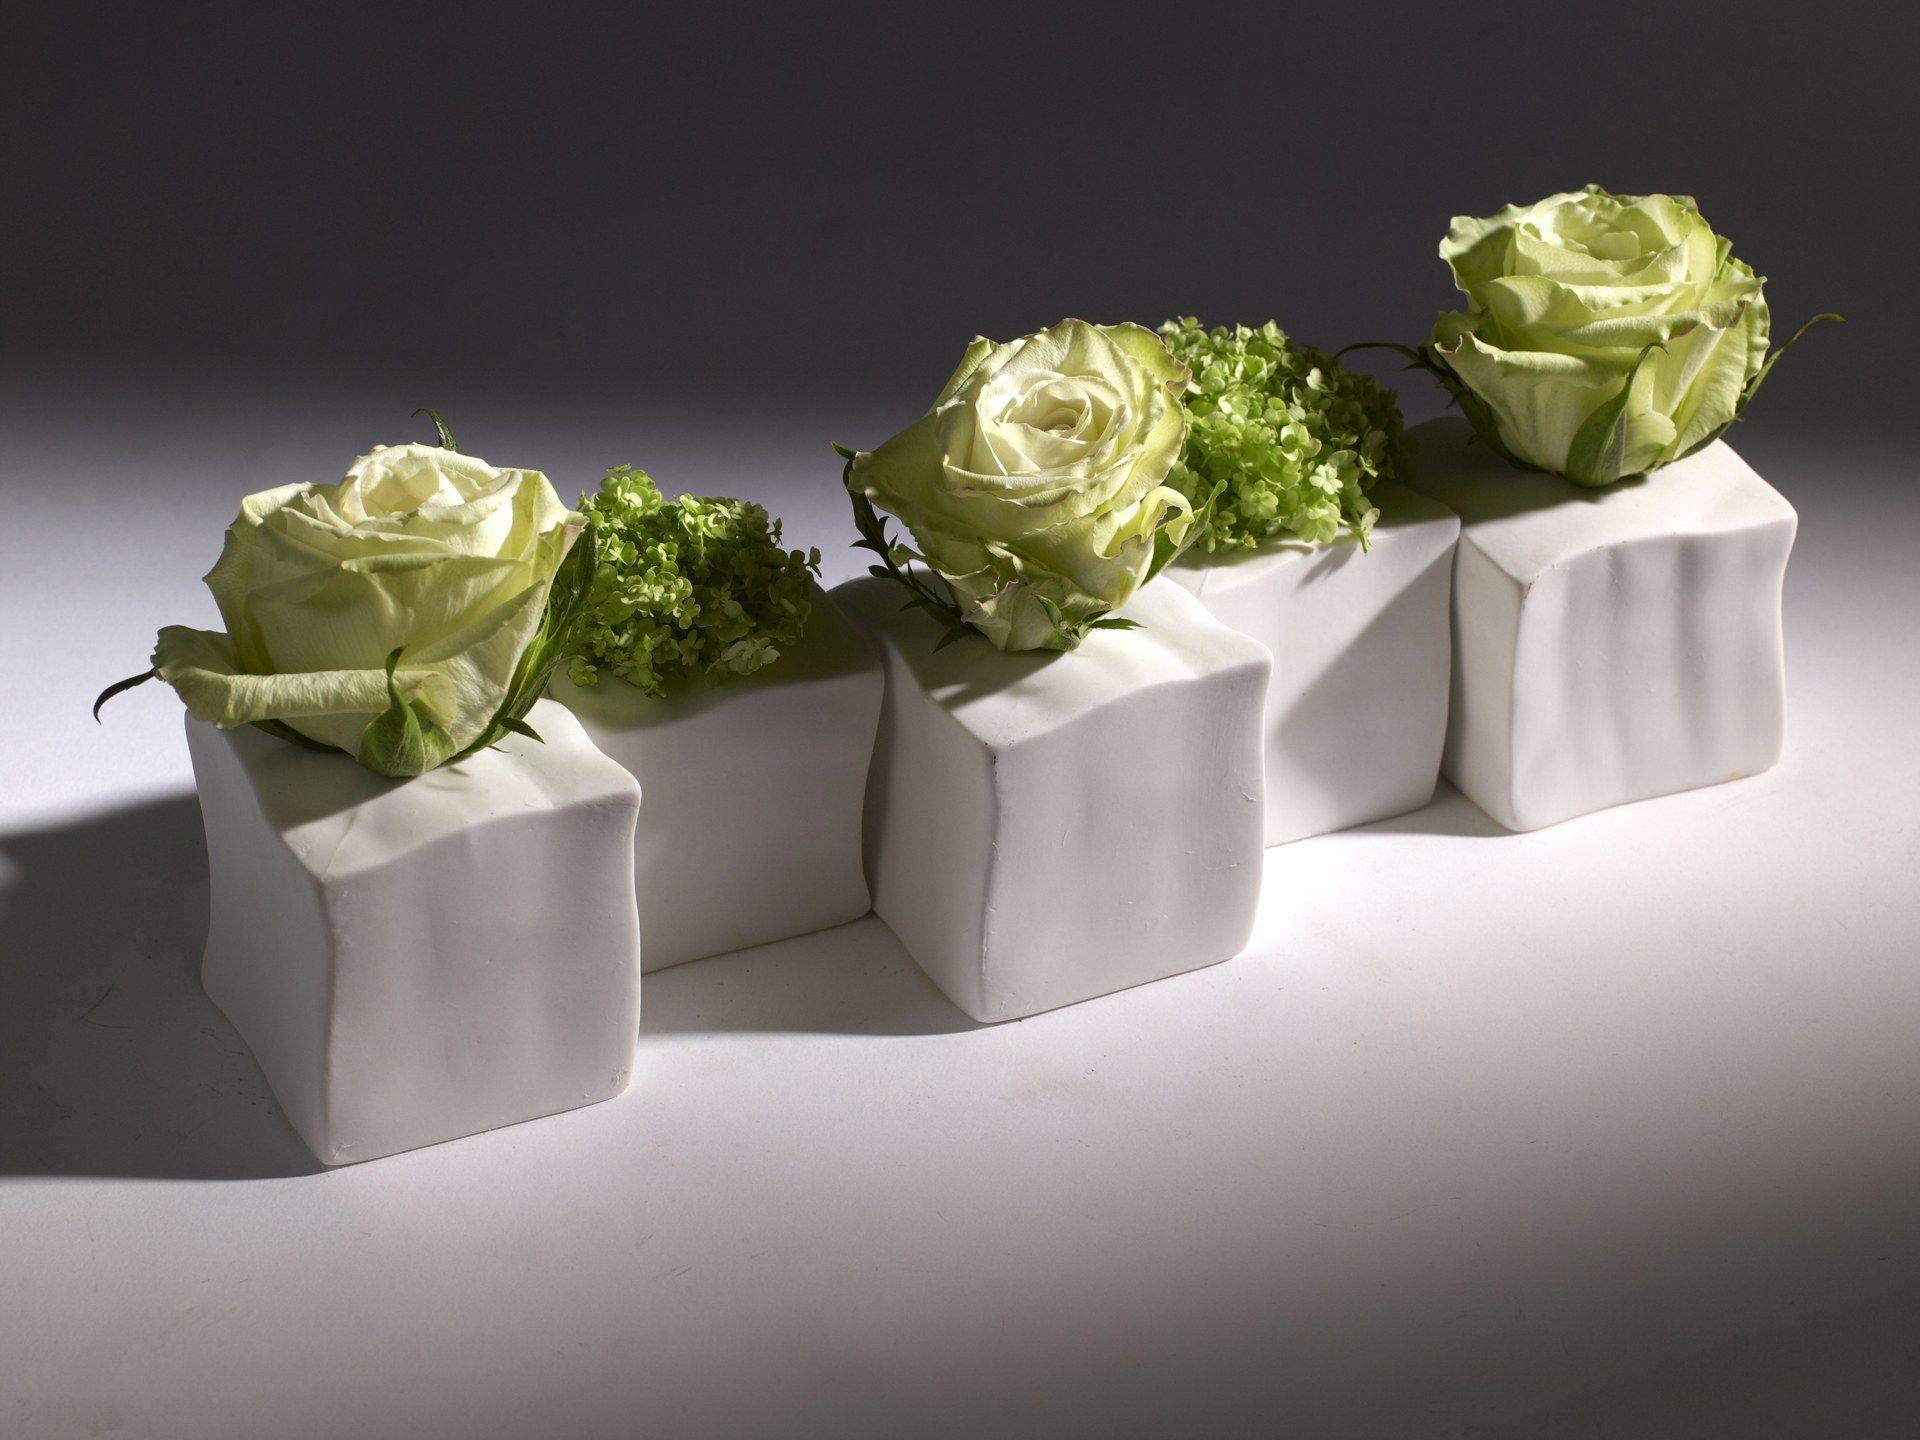 White Rock Vases Set Of 8 By Serax Pinterest